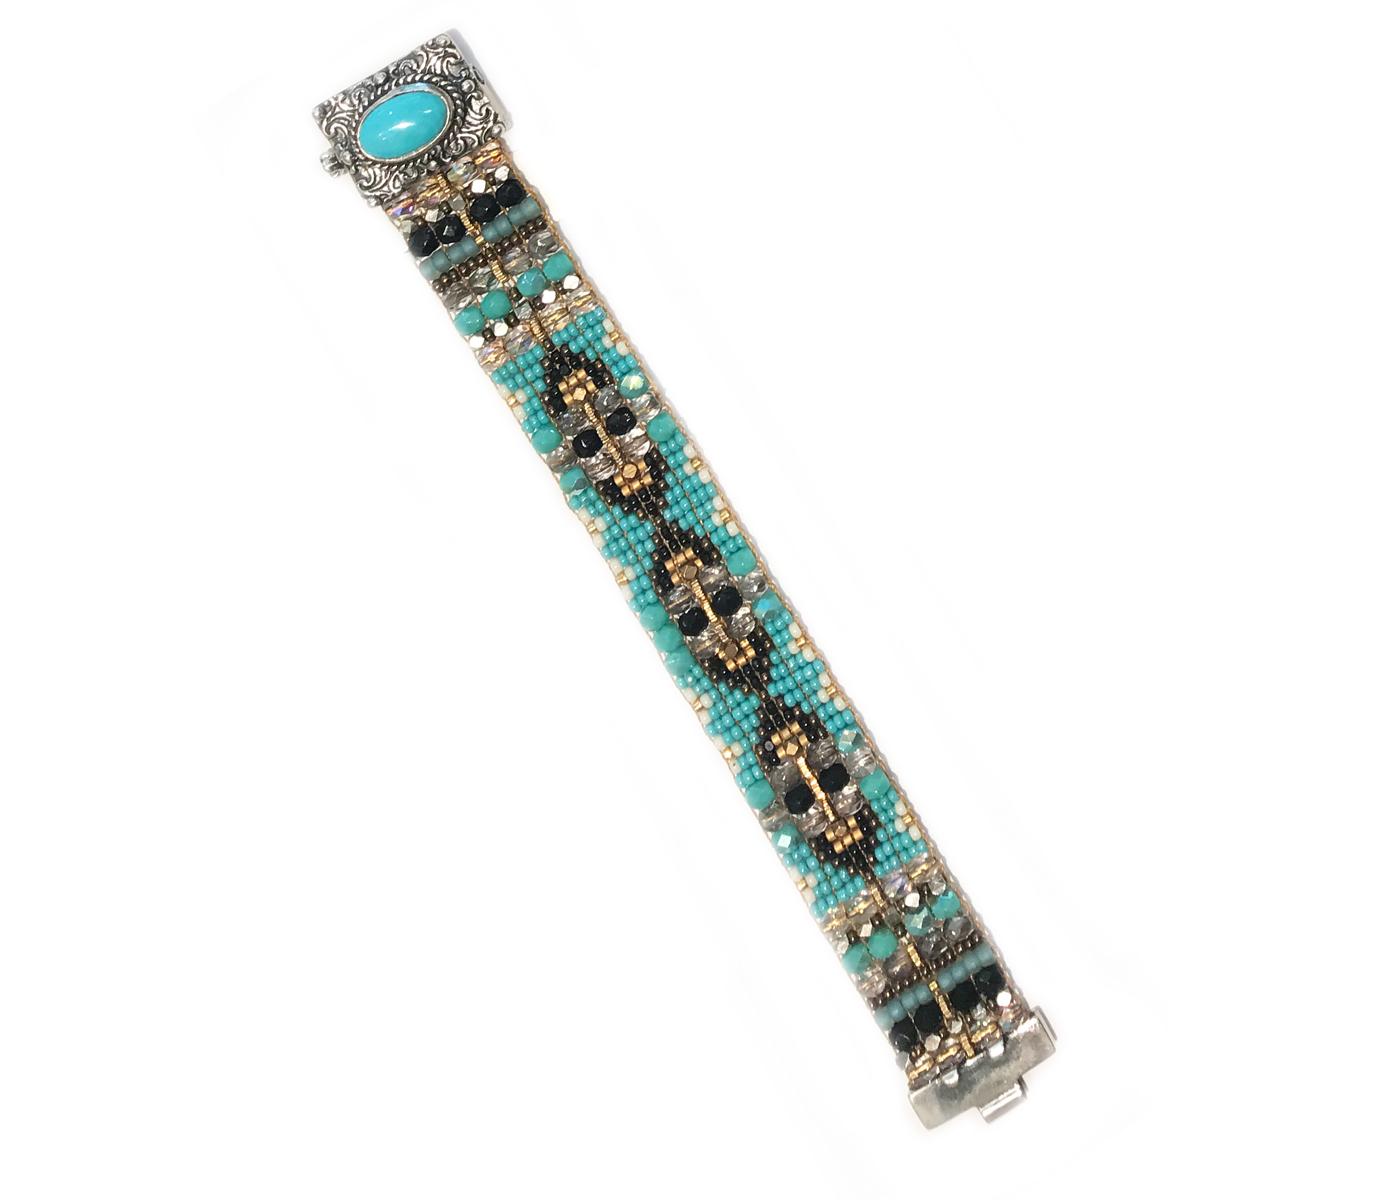 Oval Turquoise Beaded Bracelet